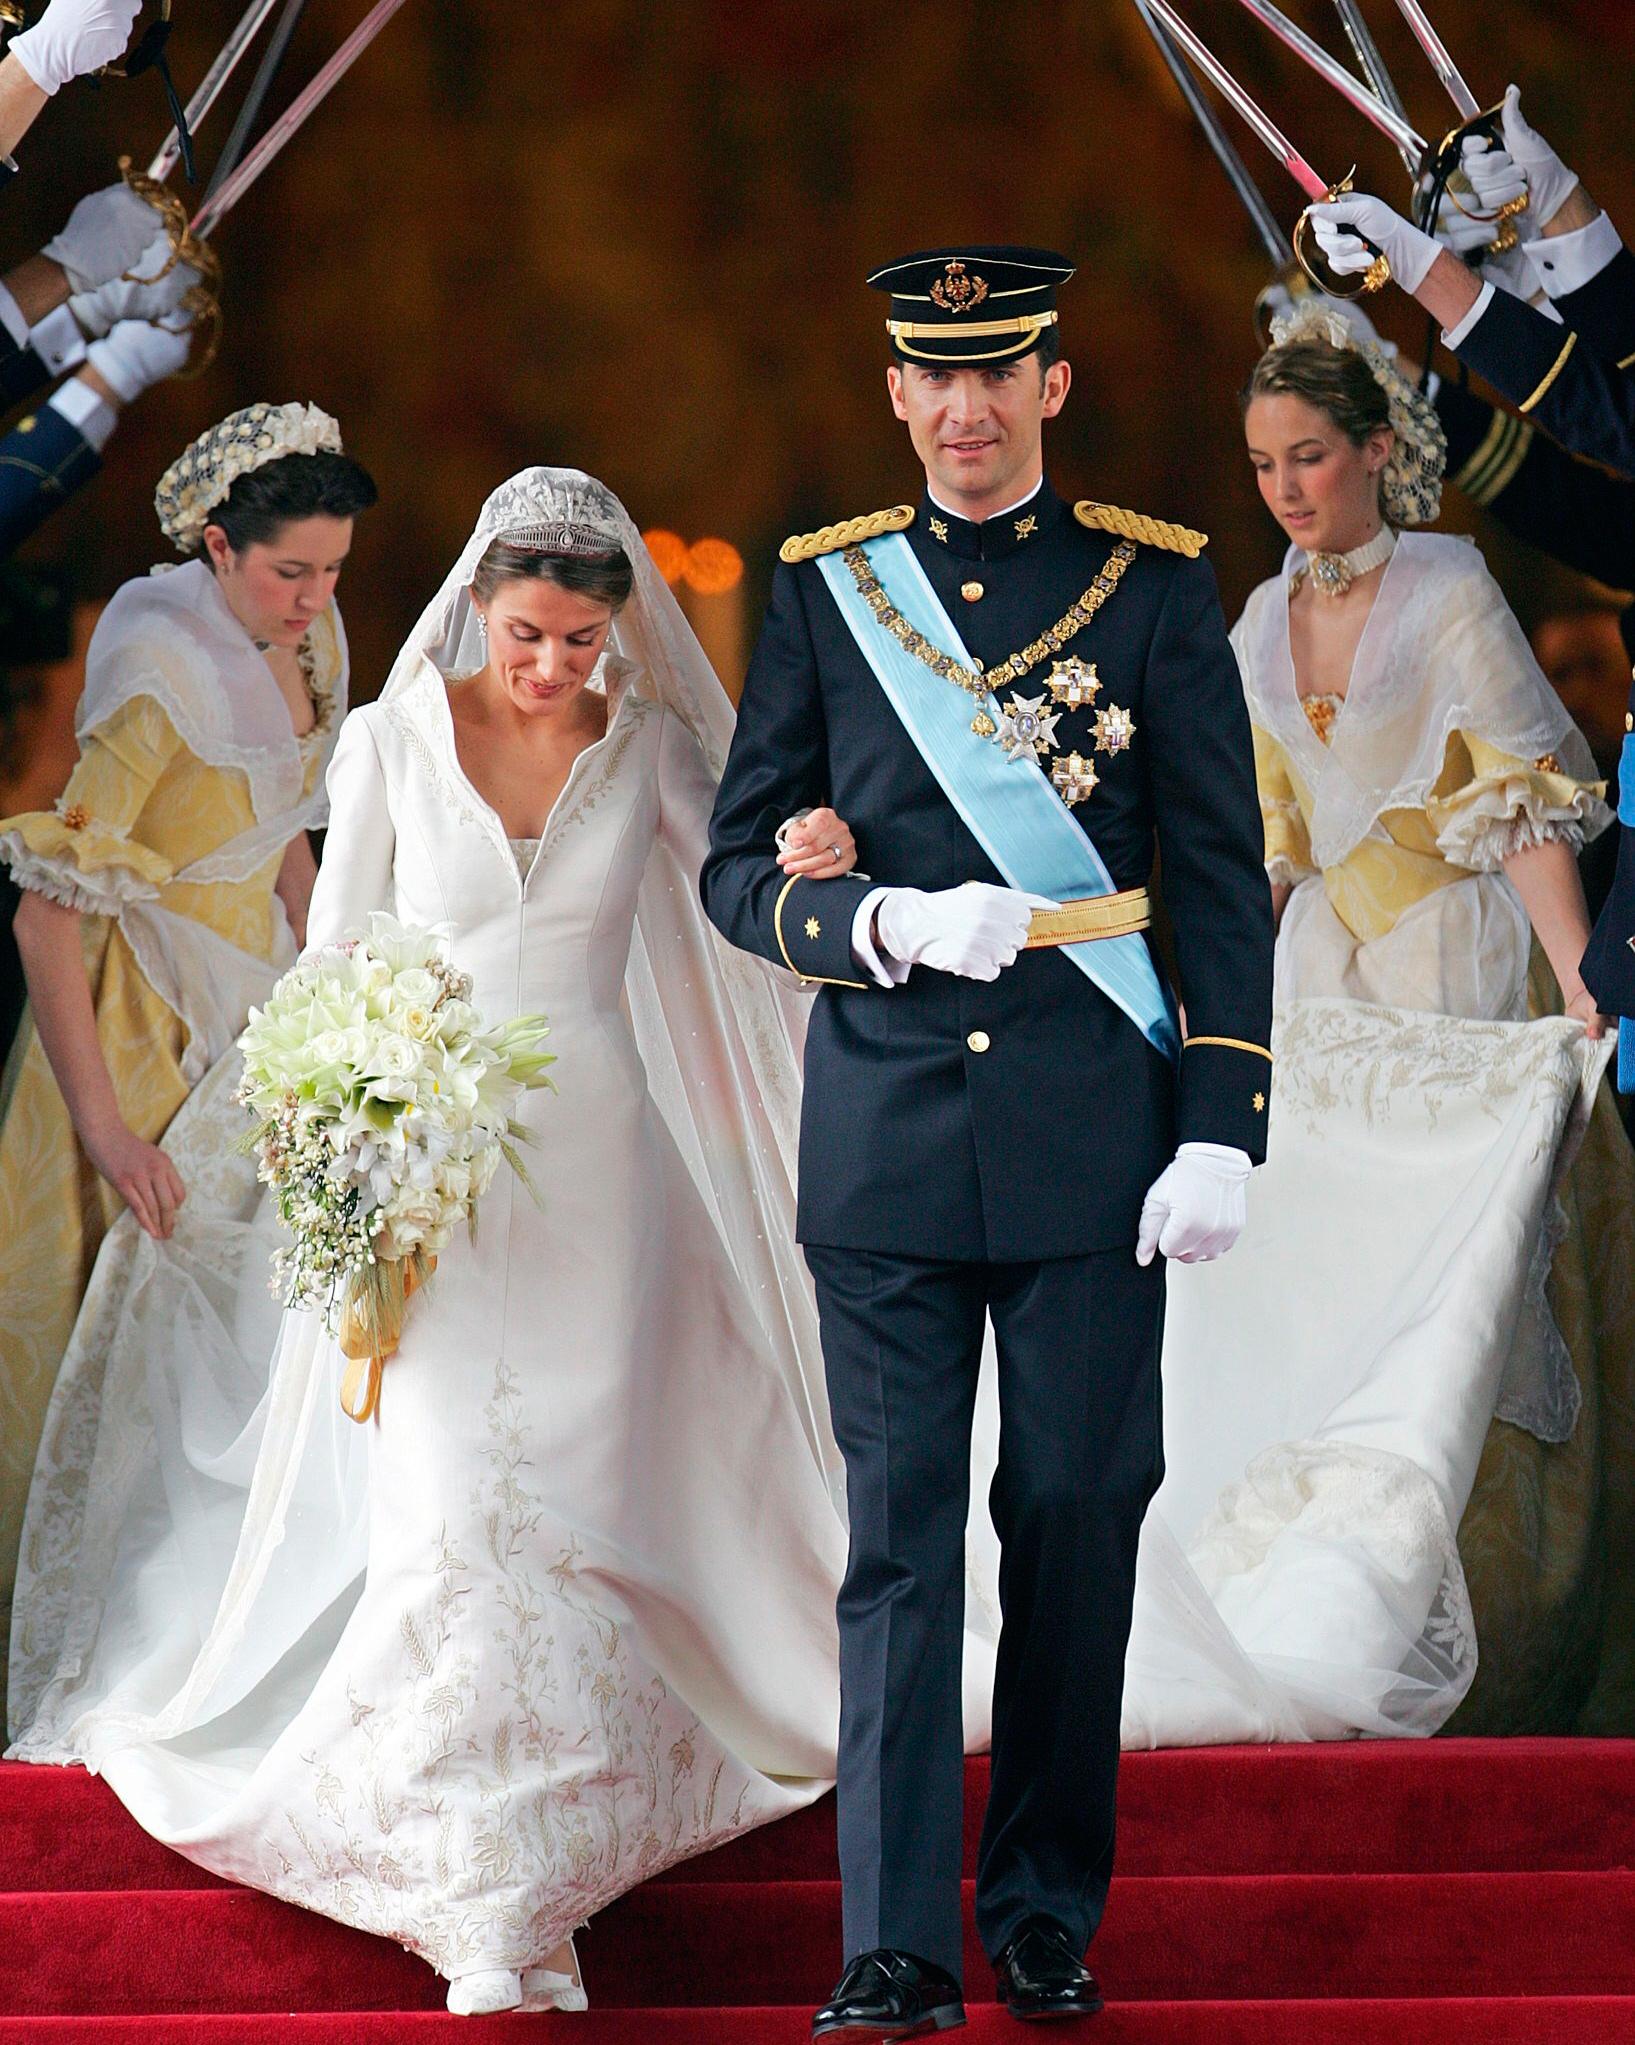 royal-wedding-dress-queen-letizia-spain-450810378-1115.jpg